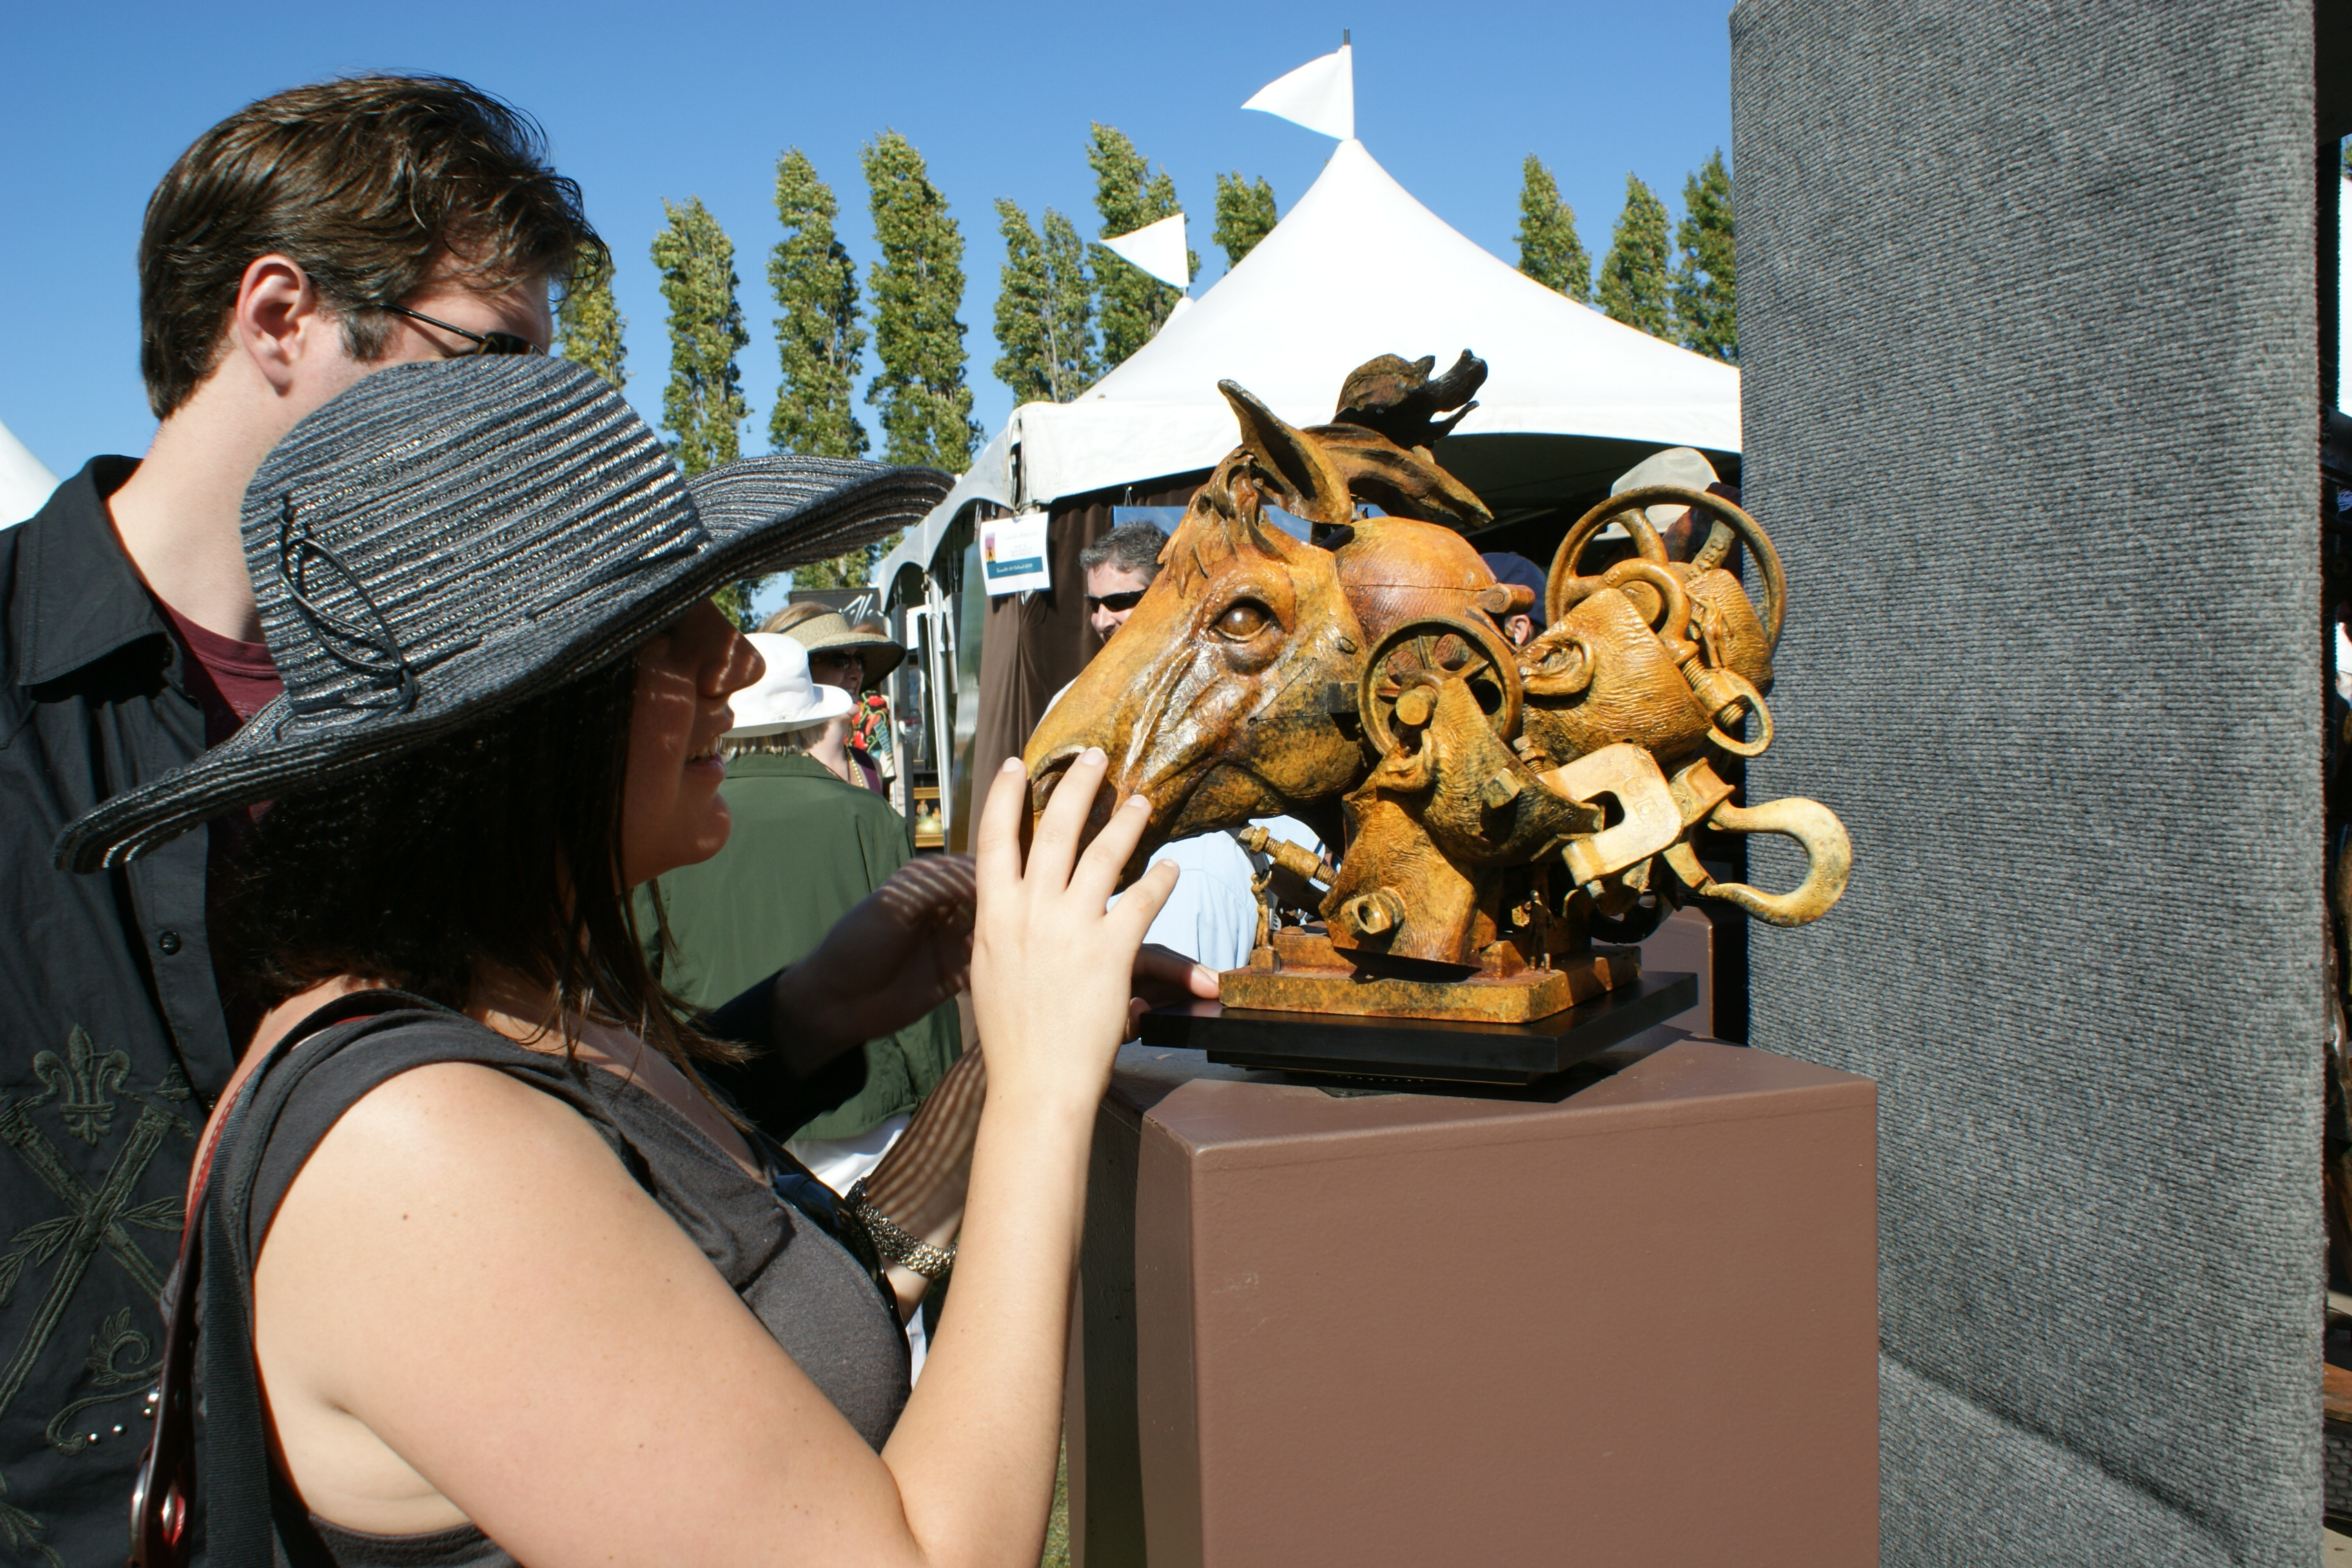 Craft Fairs - Sausalito Arts Festival by Daniela, via flickr